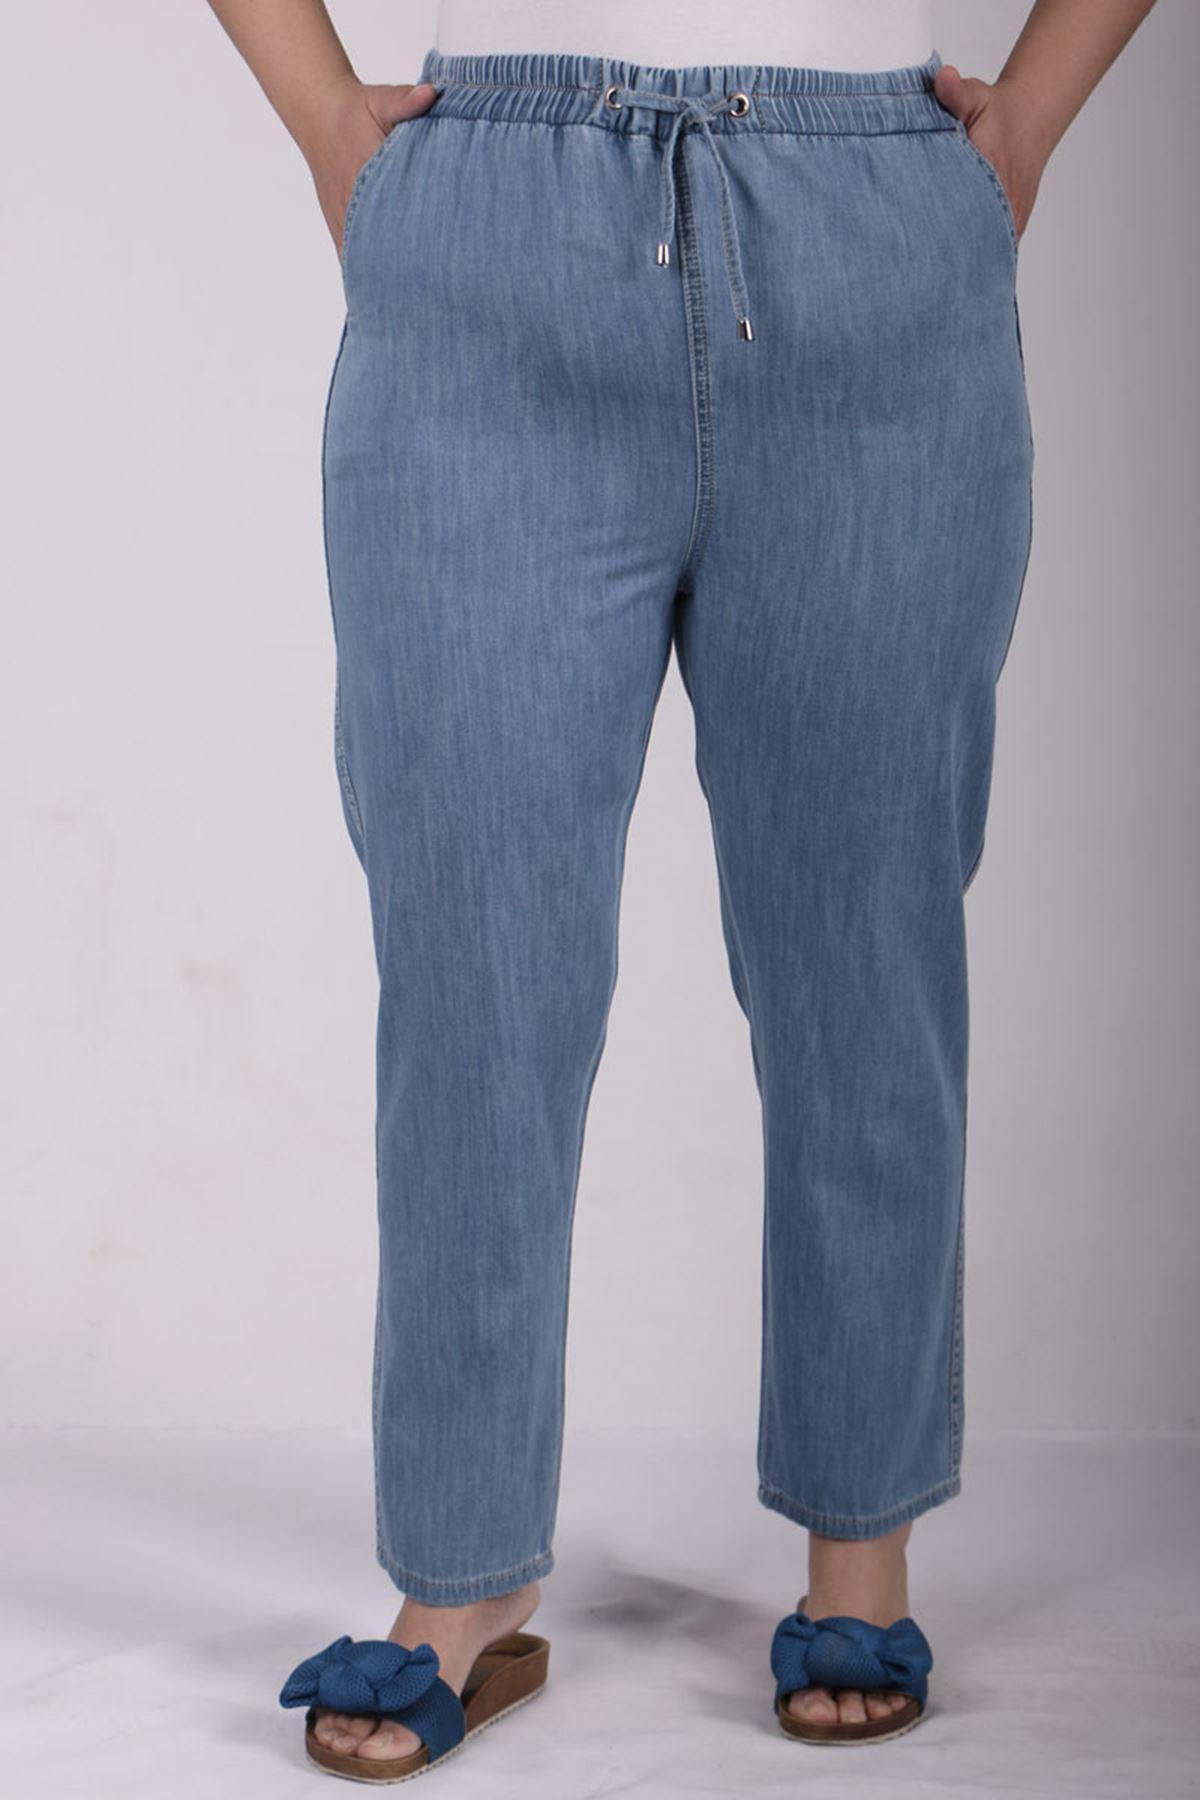 9123 Plus Size Elastic Waist Skinny Leg Jeans - Dark Navy Blue